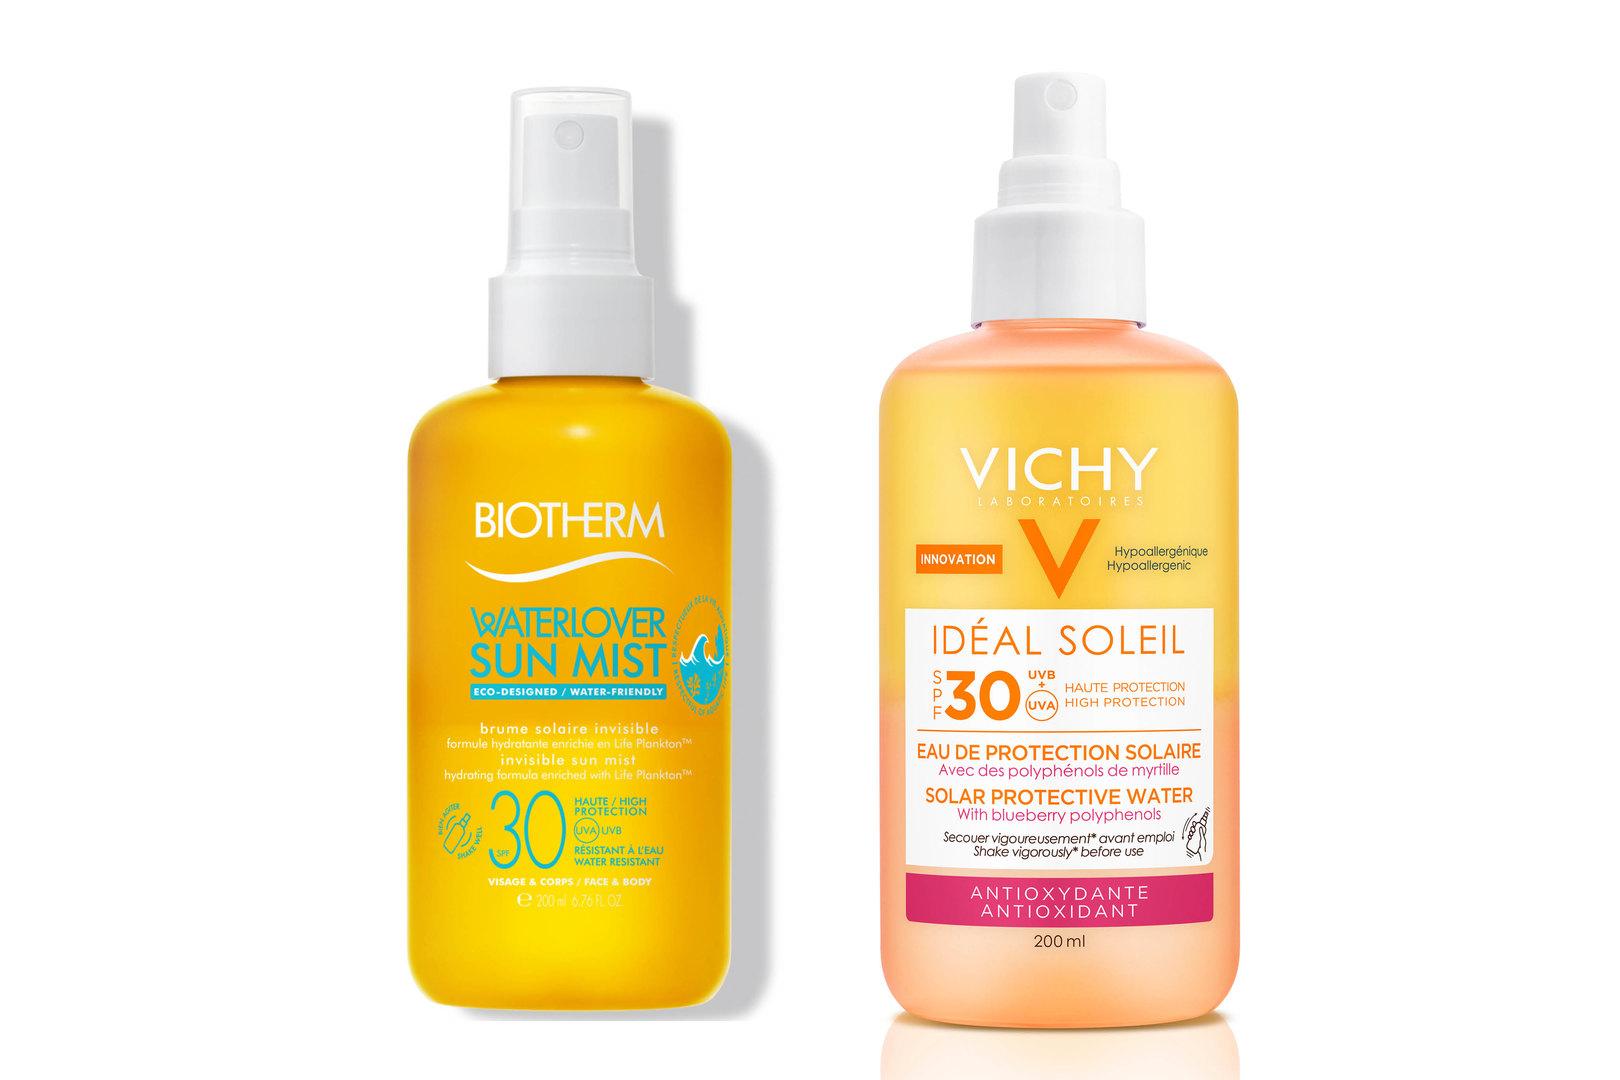 Солнцезащитный спрей Waterlover Sun Mist SPF 30, Biotherm; Солнцезащитный двухфазный спрей сантиоксидантами Ideal Soleil SPF 30, Vichy